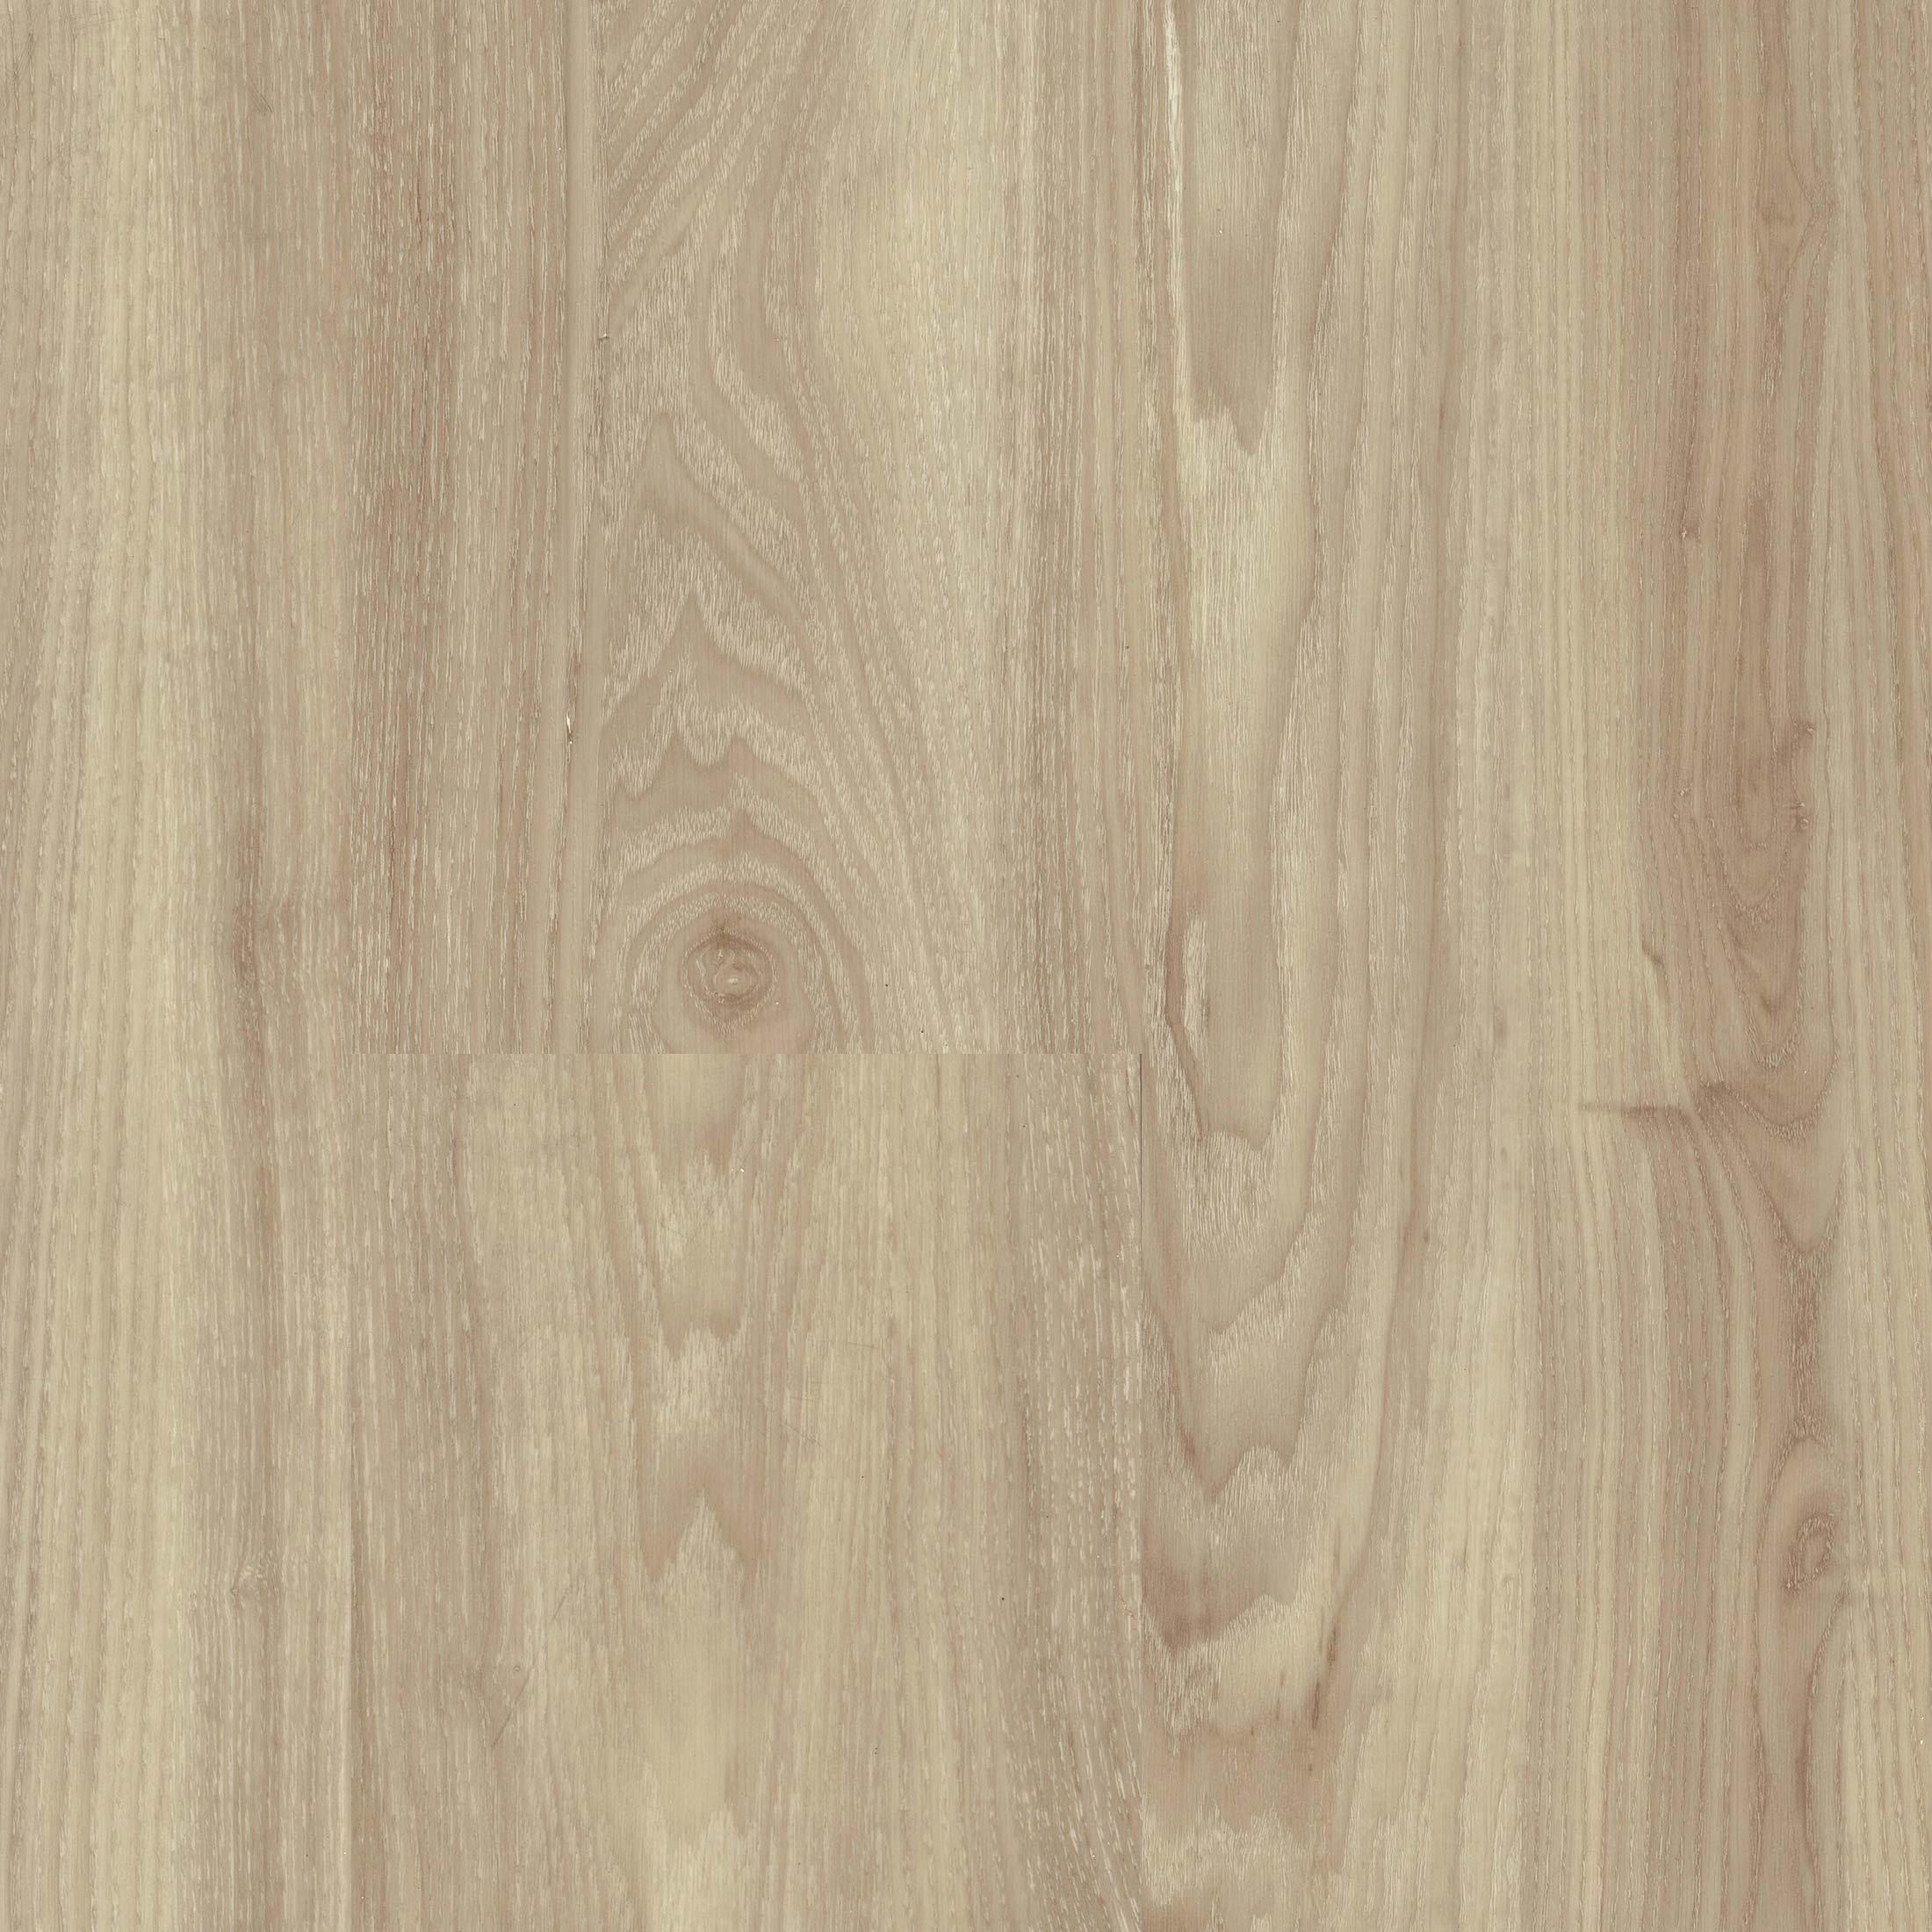 Supreme Click Innocore Vanilla Oak Wpc Vinyl Flooring With Cork Back Vinyl Flooring Vinyl Plank Flooring Flooring